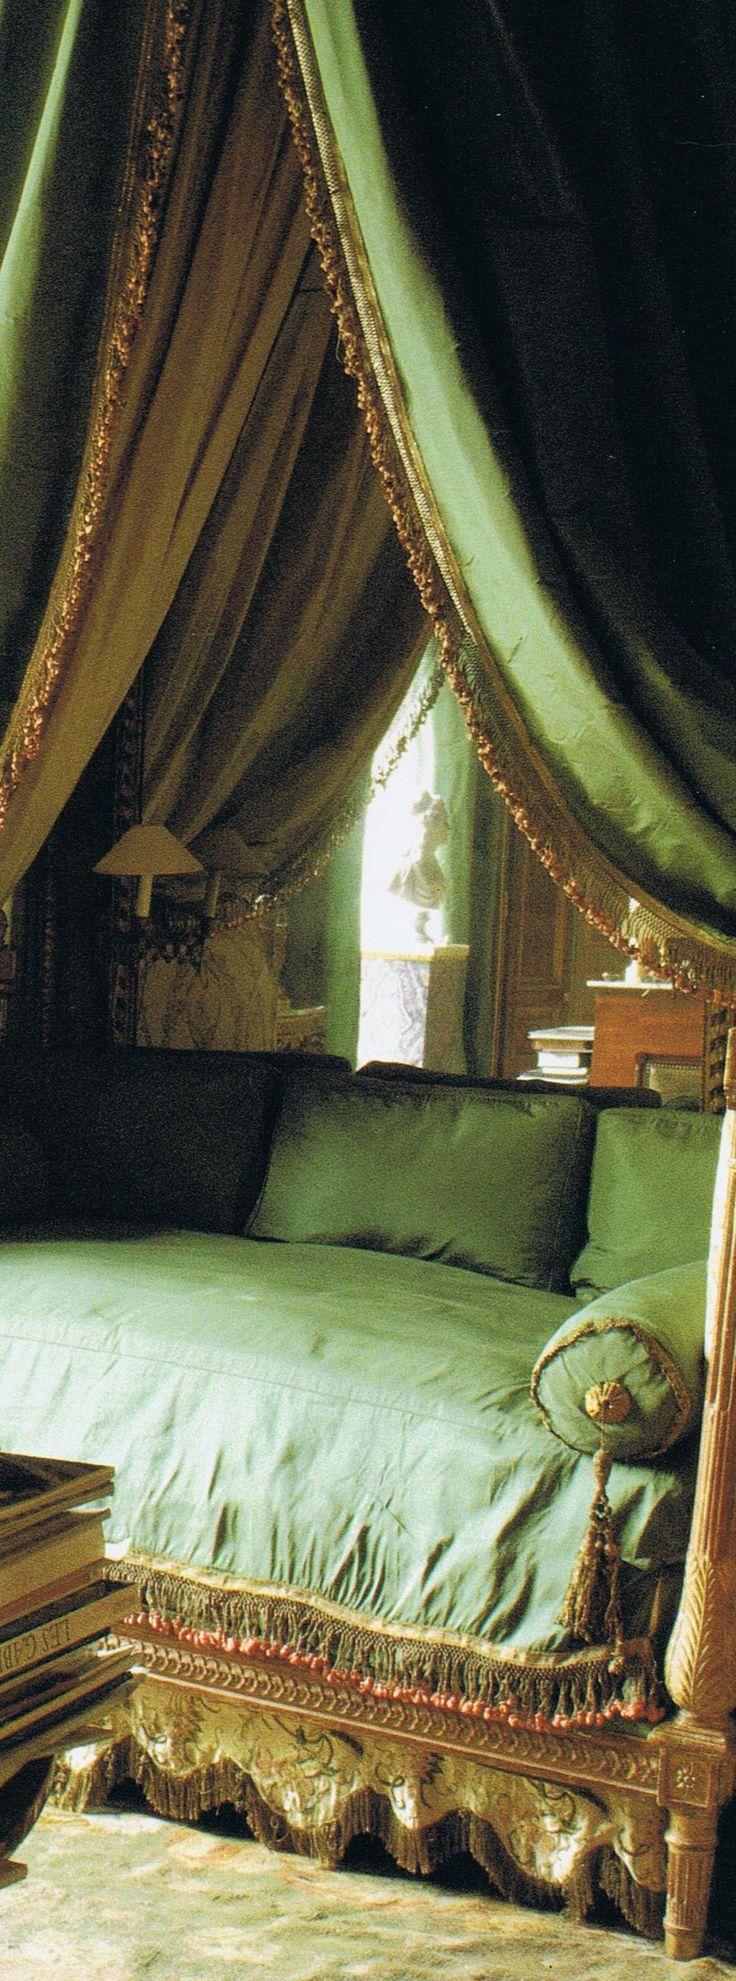 The Bed Duchesse de Mouchy